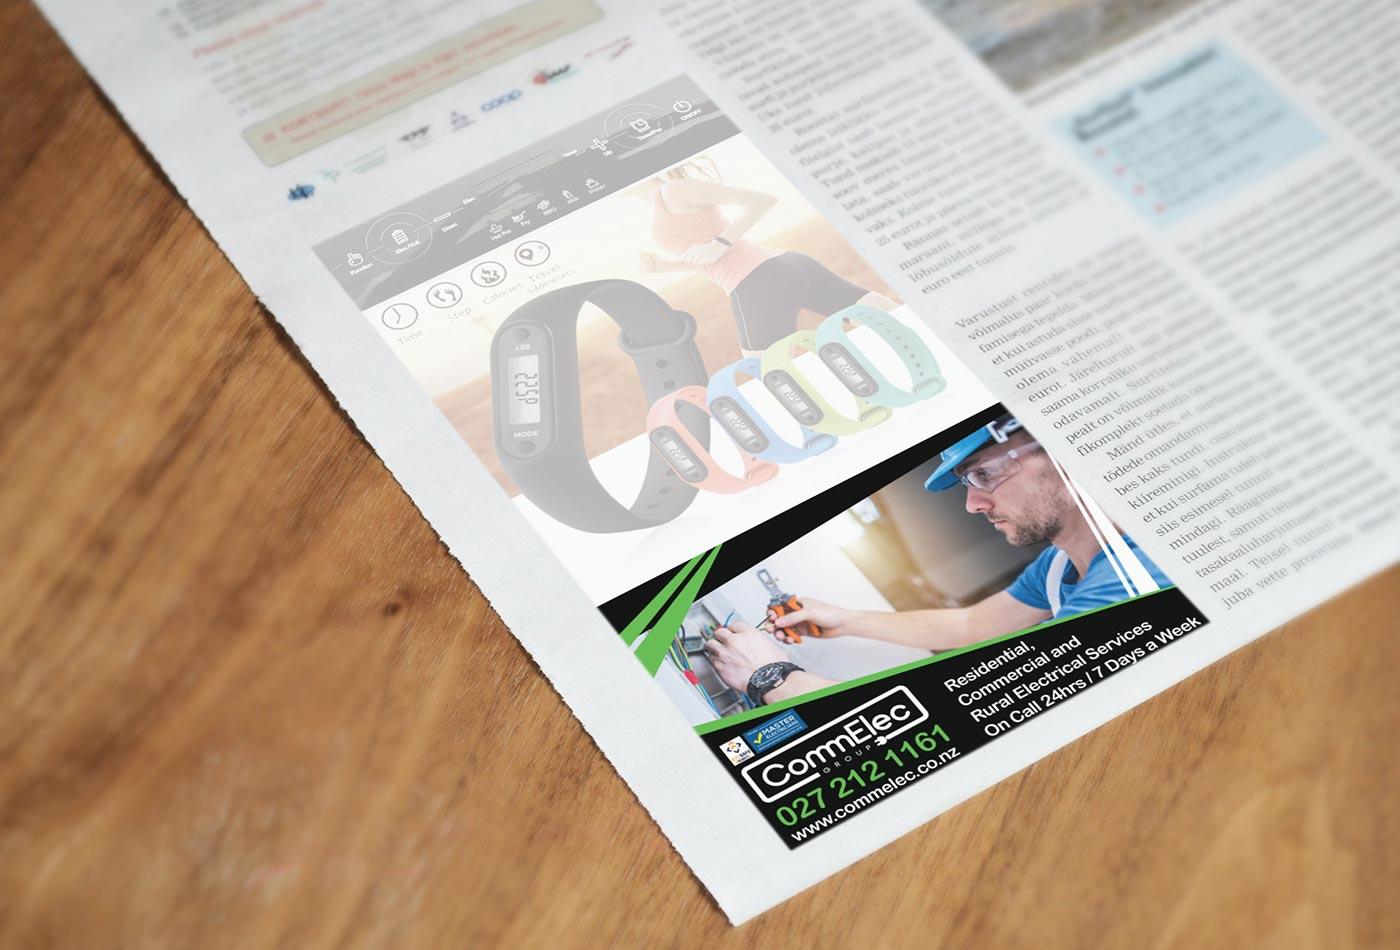 CommElec Group newspaper advert design